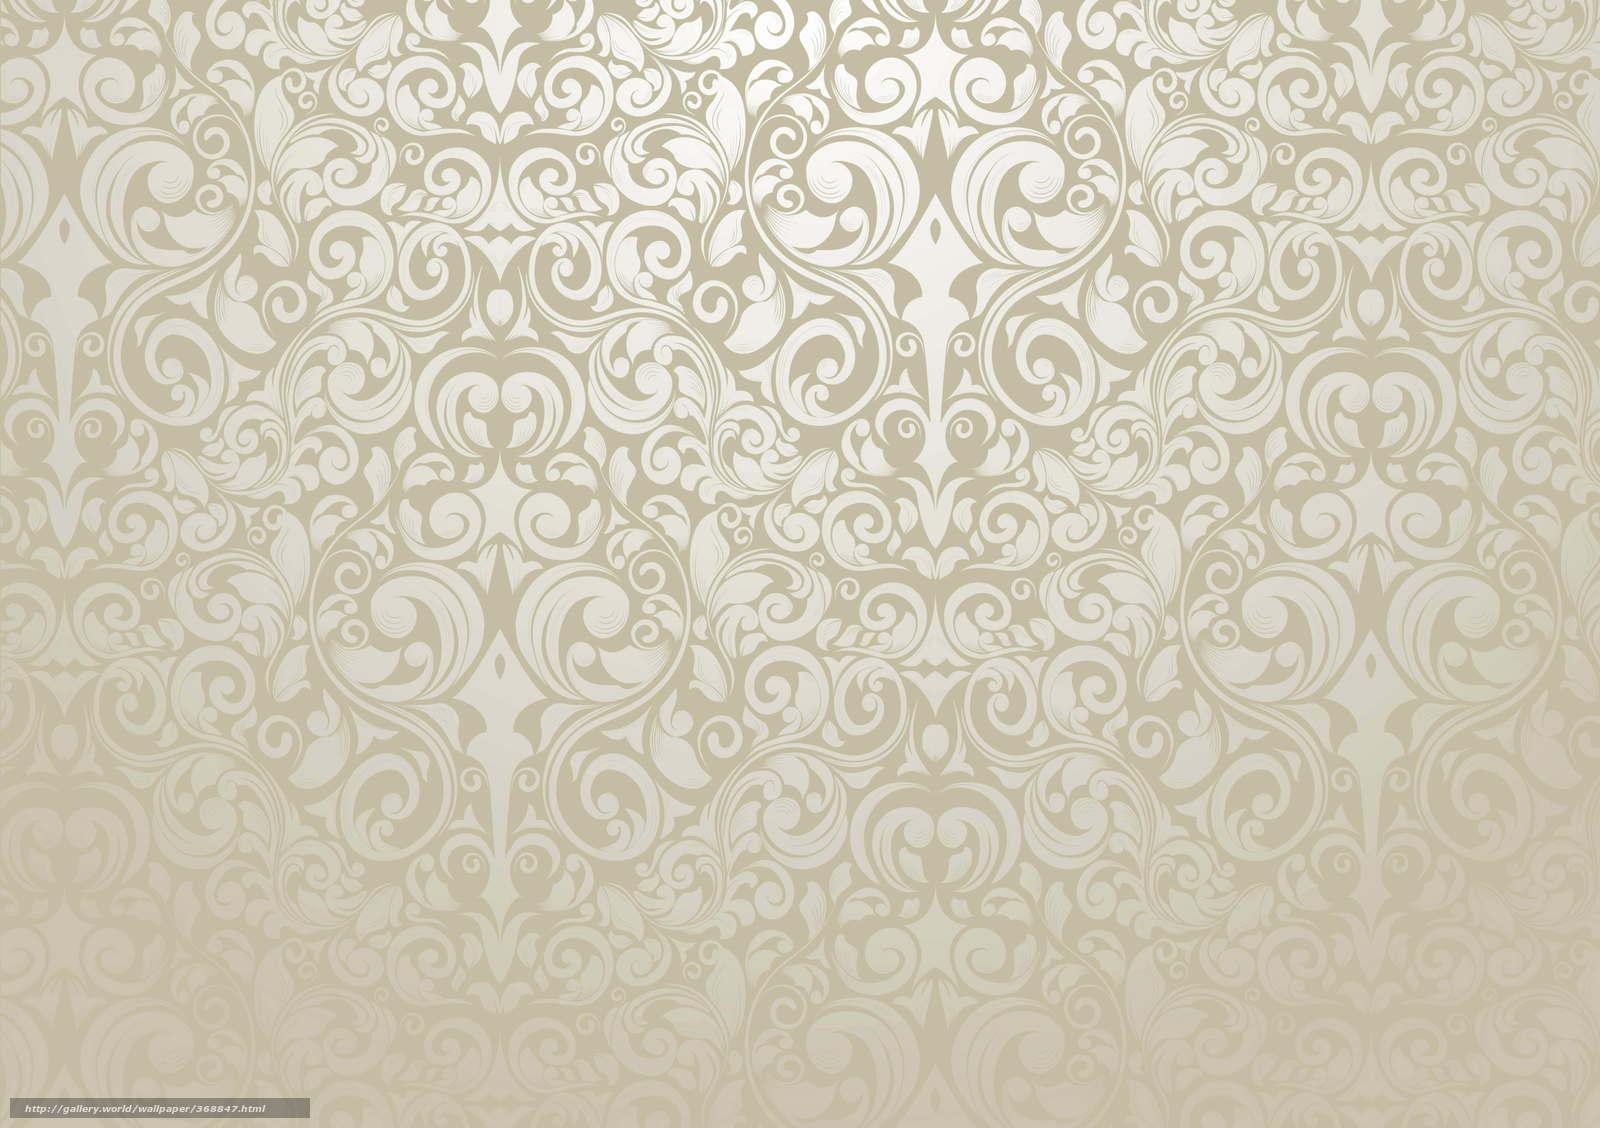 Descargar gratis papel pintado textura fondo escritorio - Papel pintado imagenes ...